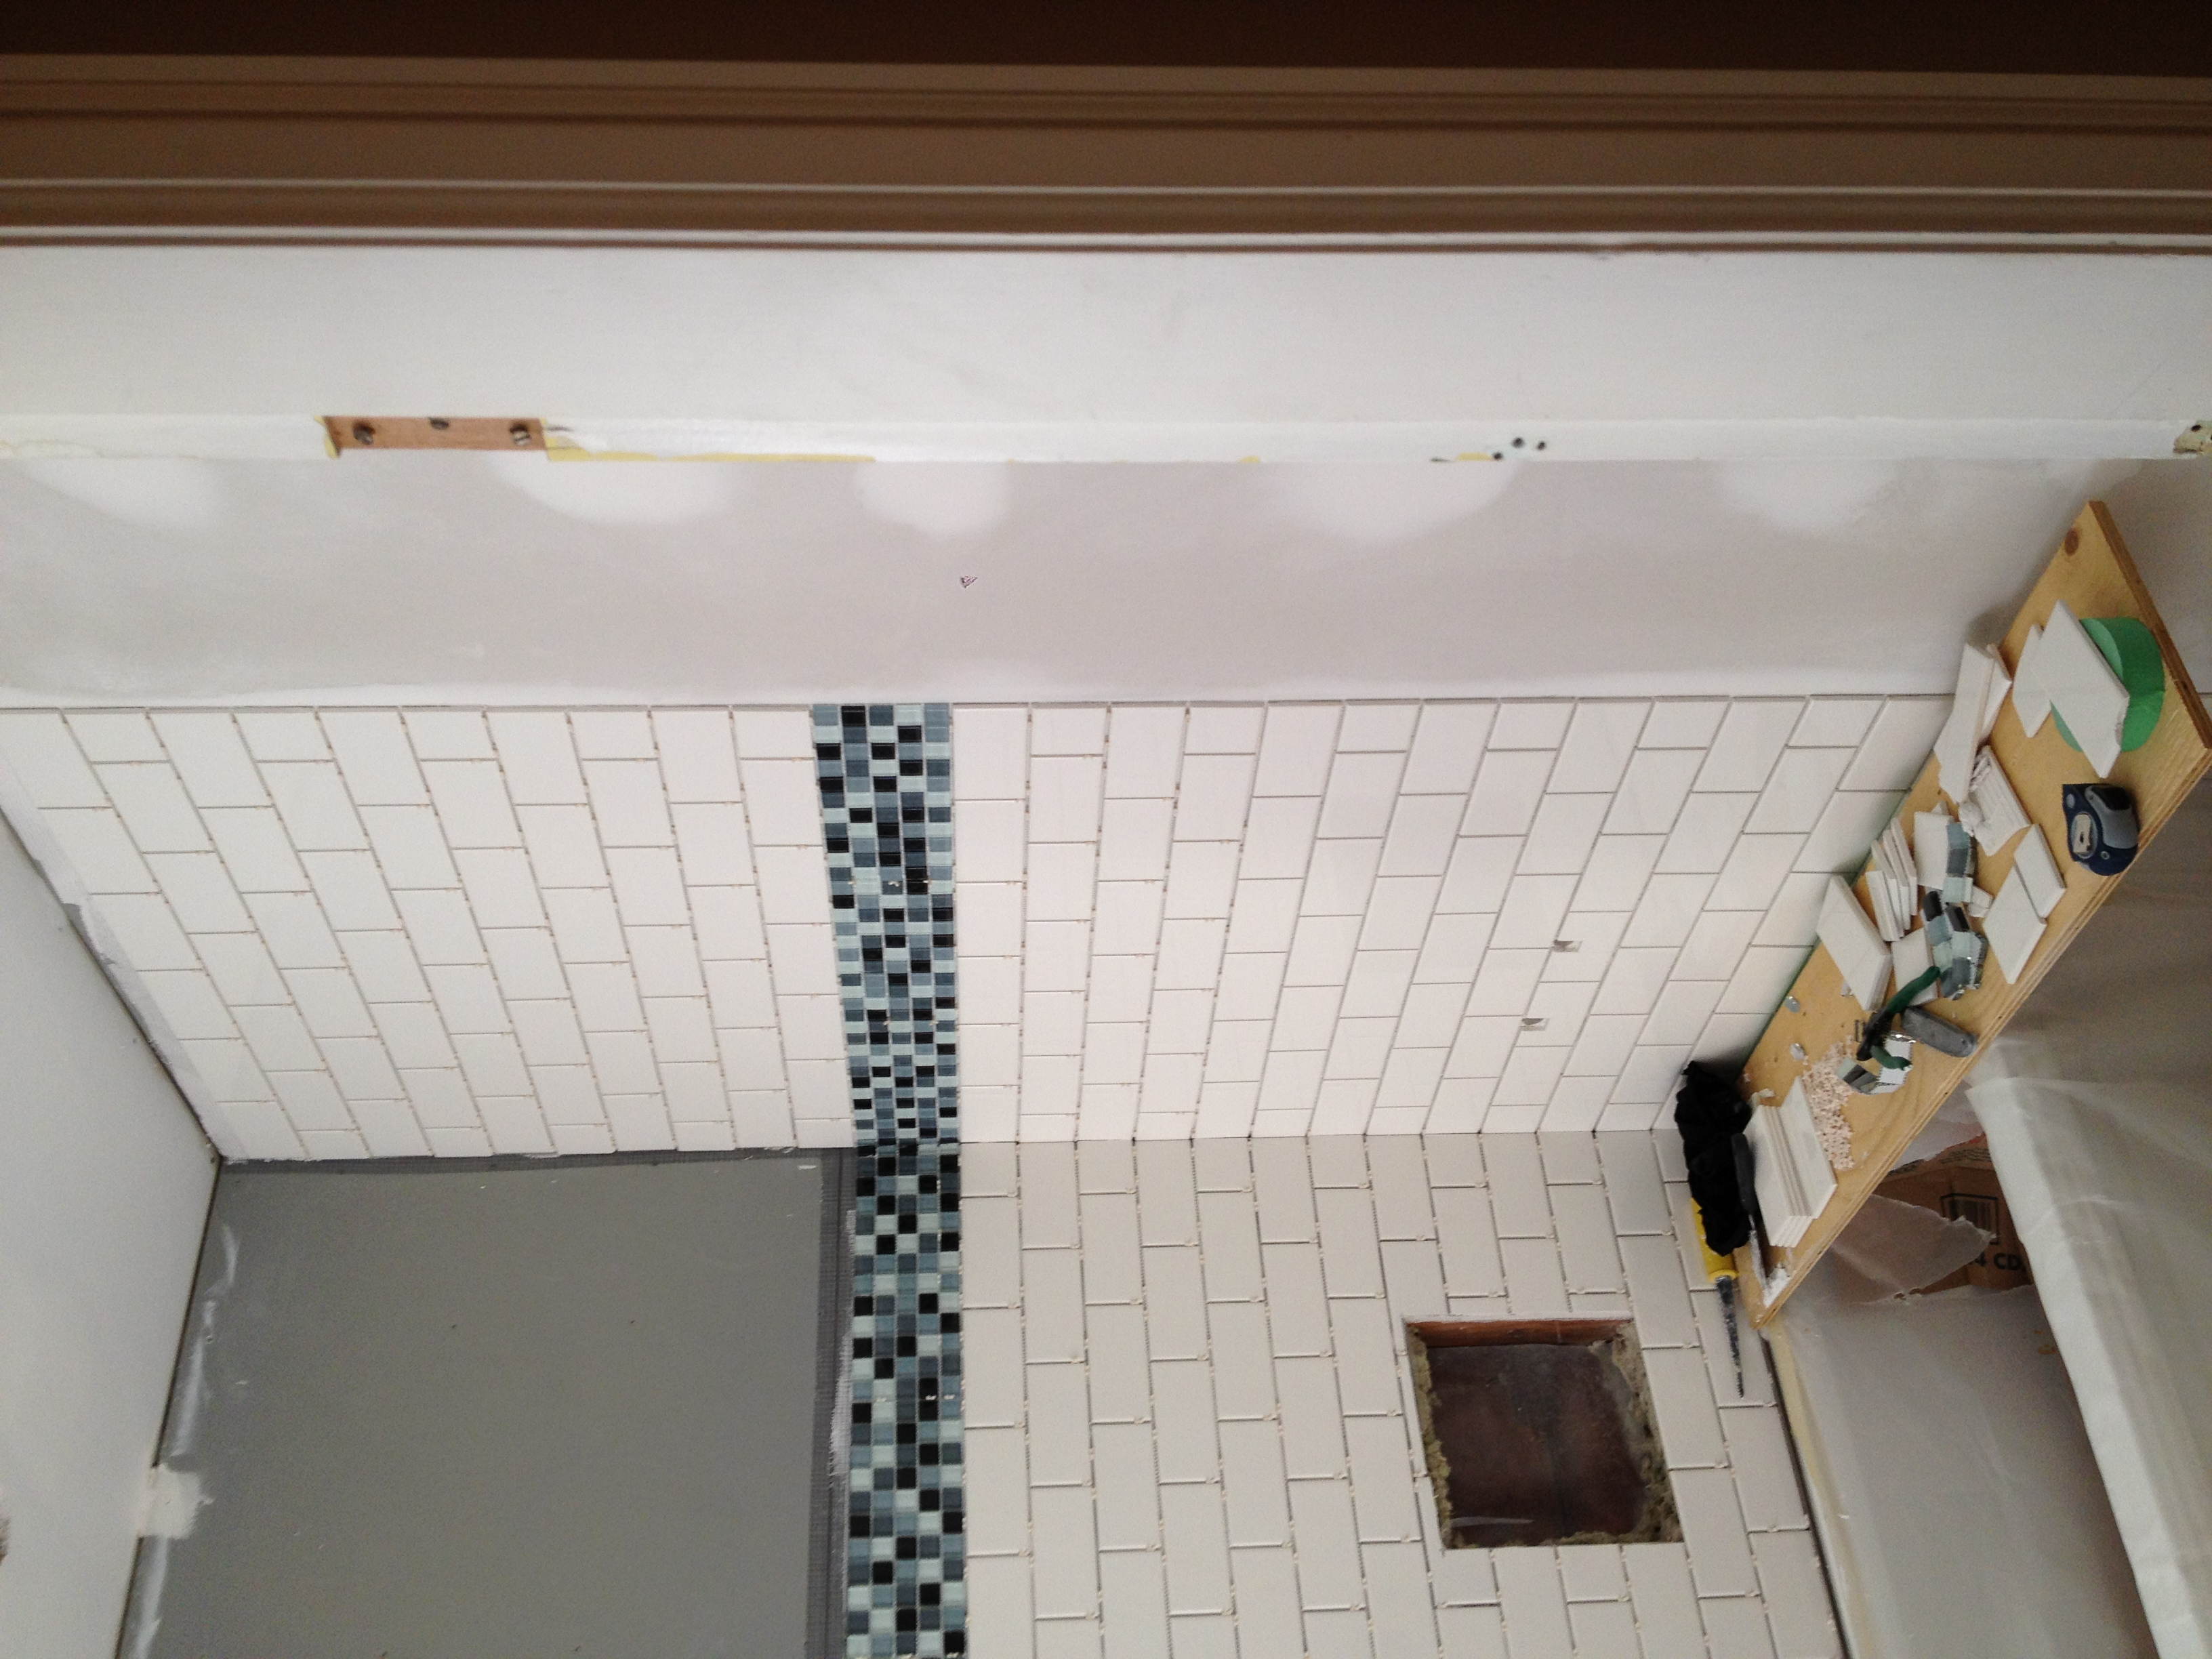 Subway Tile install